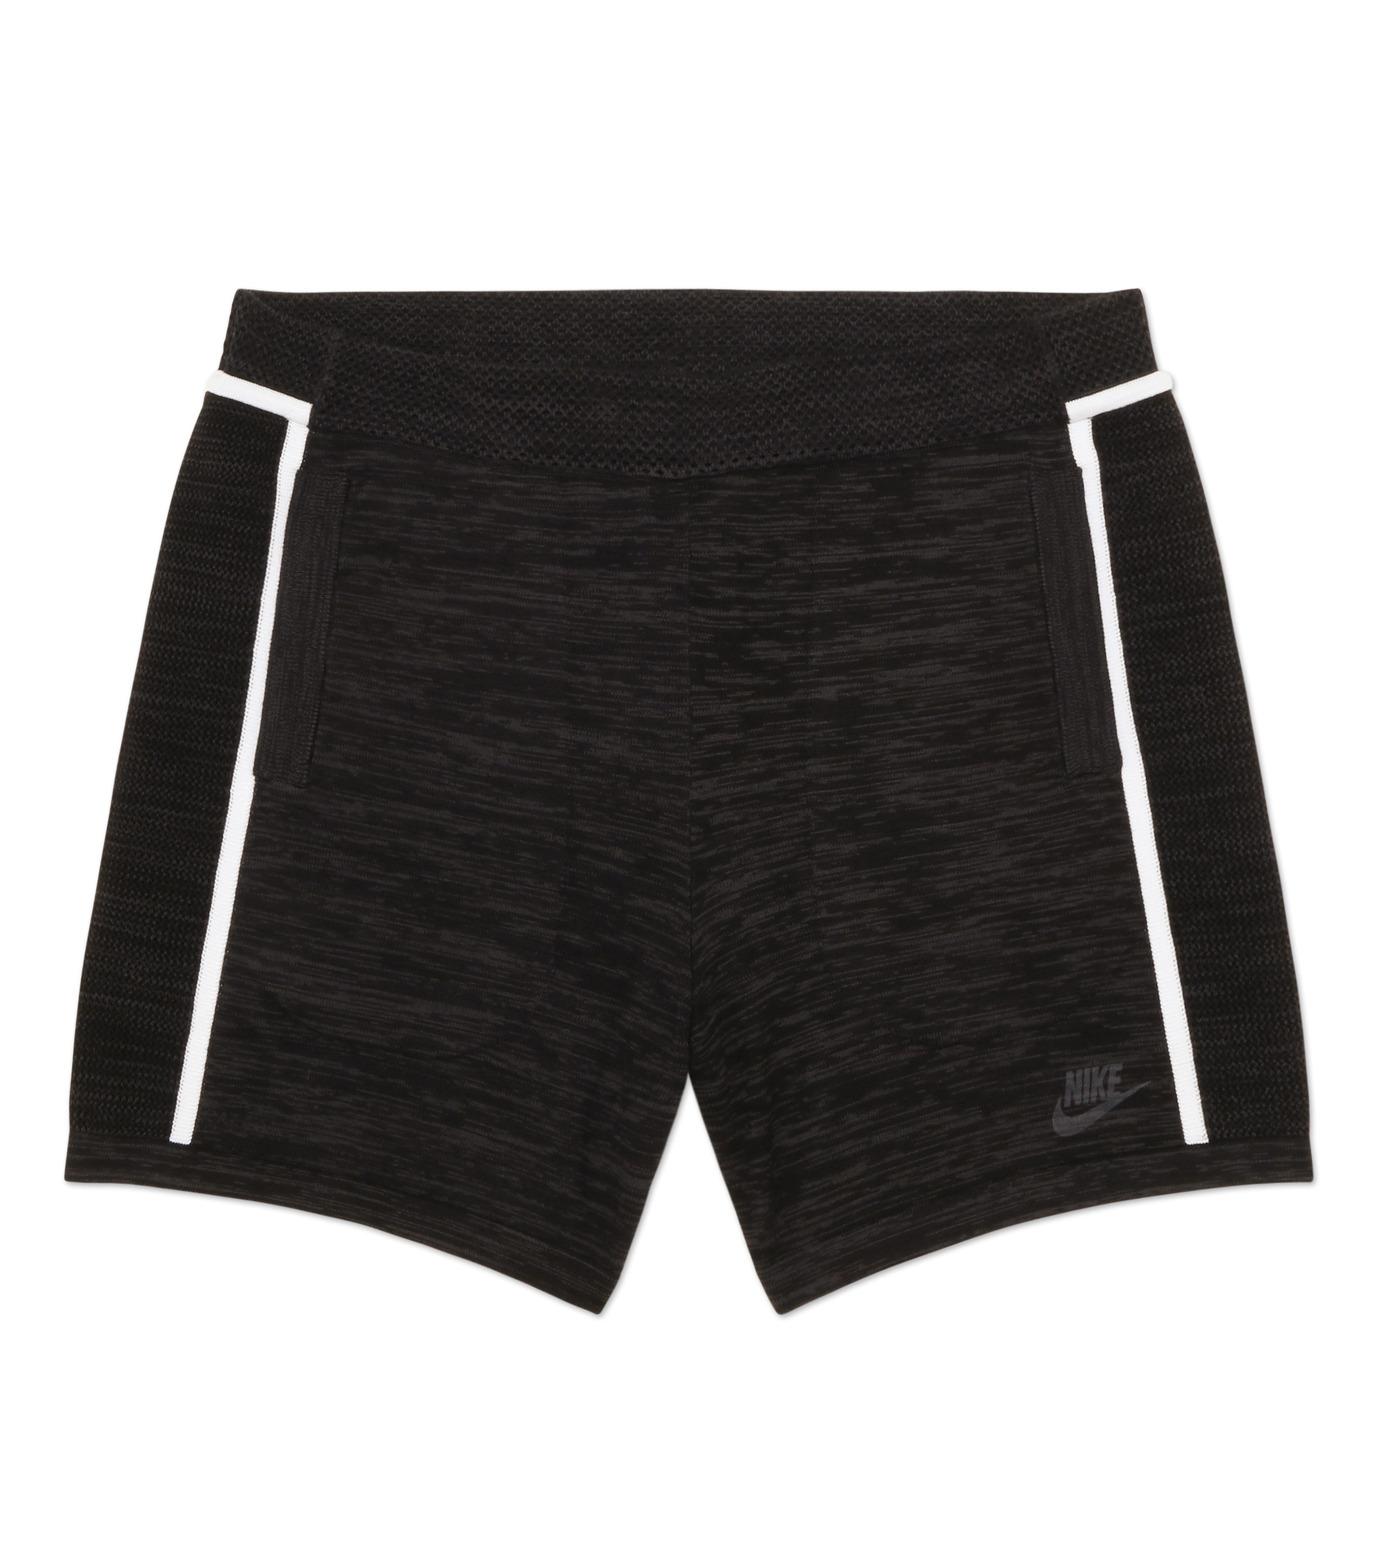 NIKE(ナイキ)のTECH KNIT SHORT-BLACK(パンツ/pants)-747981-010-13 拡大詳細画像1